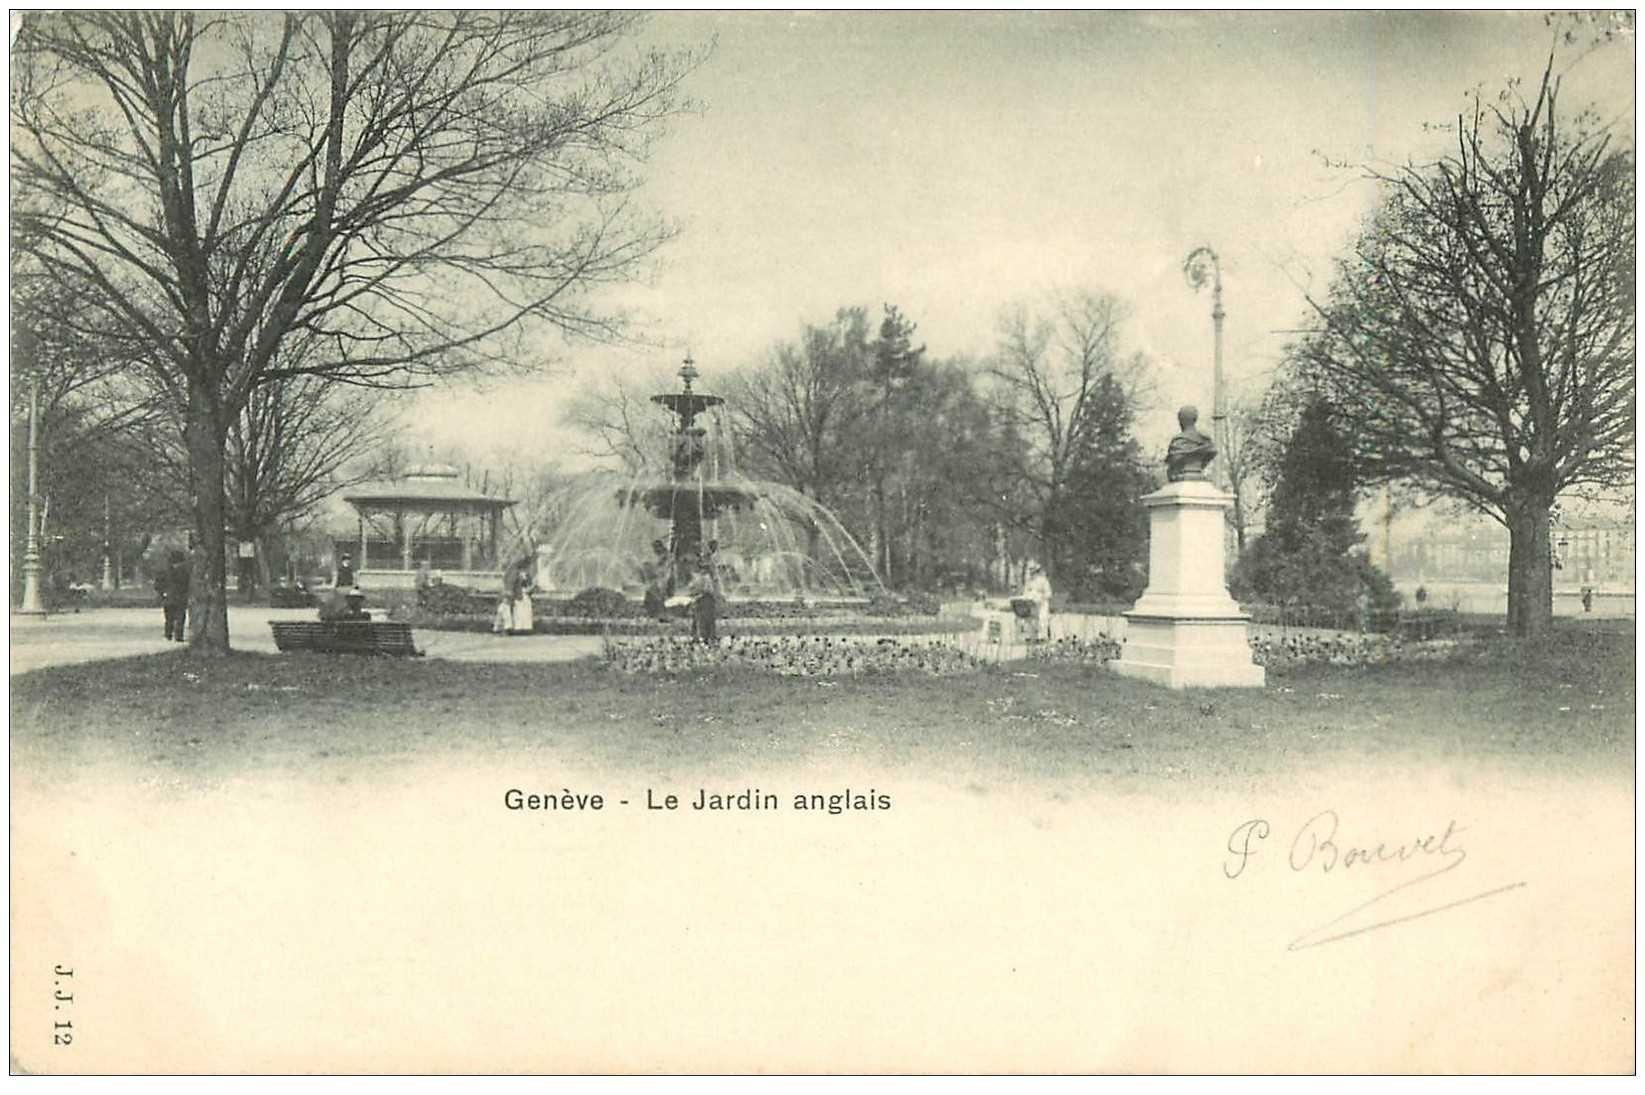 Carte postale ancienne suisse gen ve le jardin anglais 1903 for Jardin anglais geneve suisse